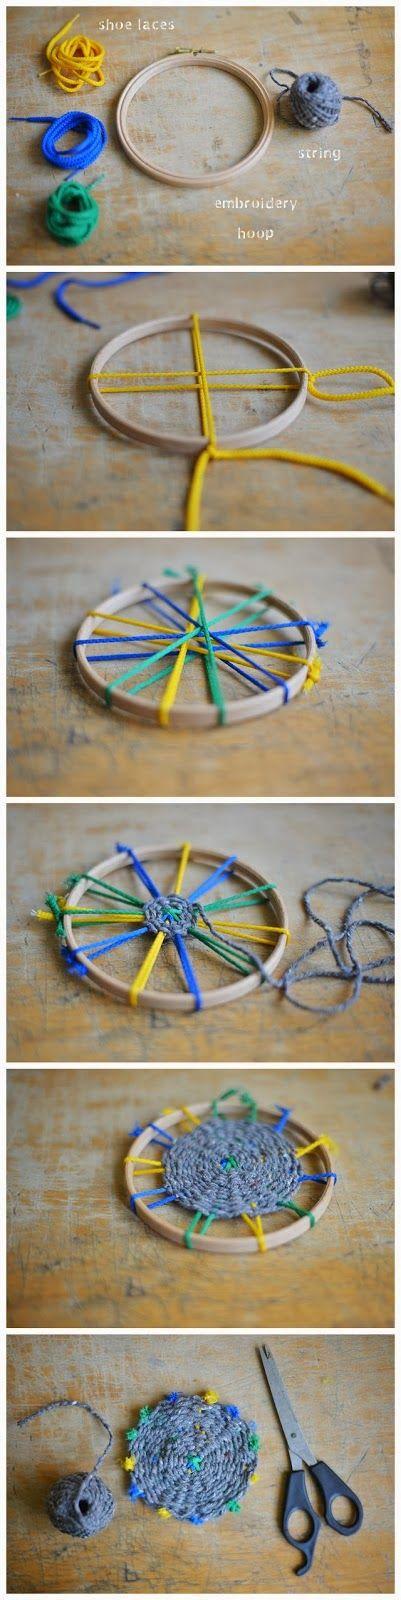 Amazing Race-TASTE AROUND THE WORLD Diy : Woven Coasters